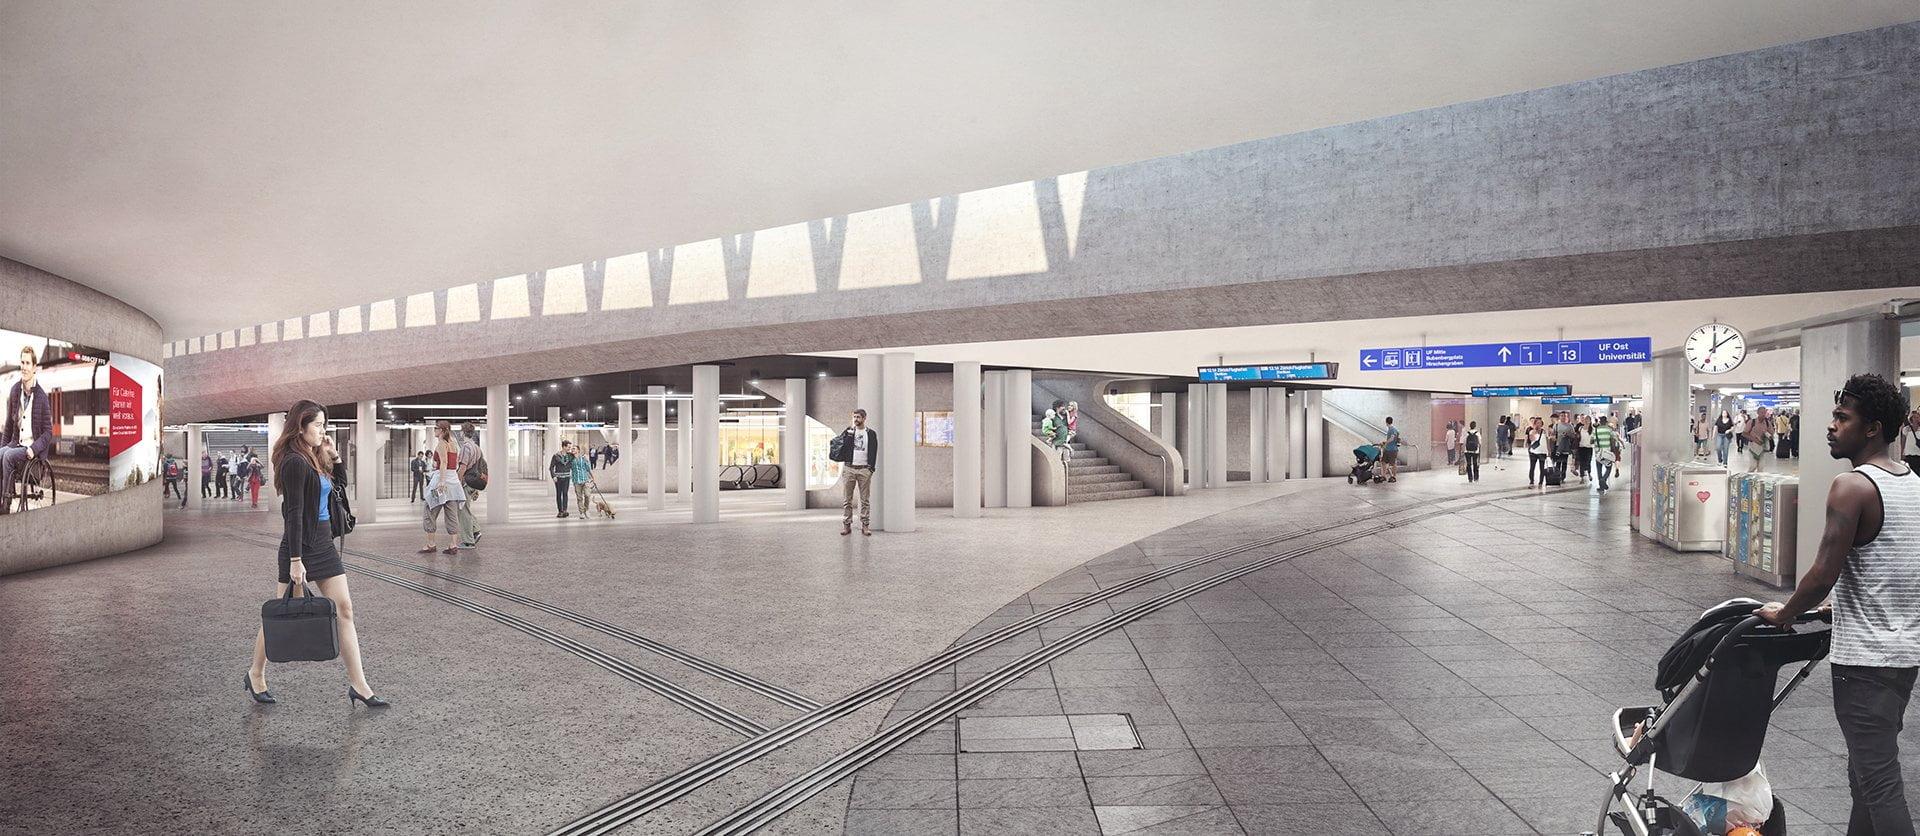 SBB, Bahnhof Bern, PU, ikonaut